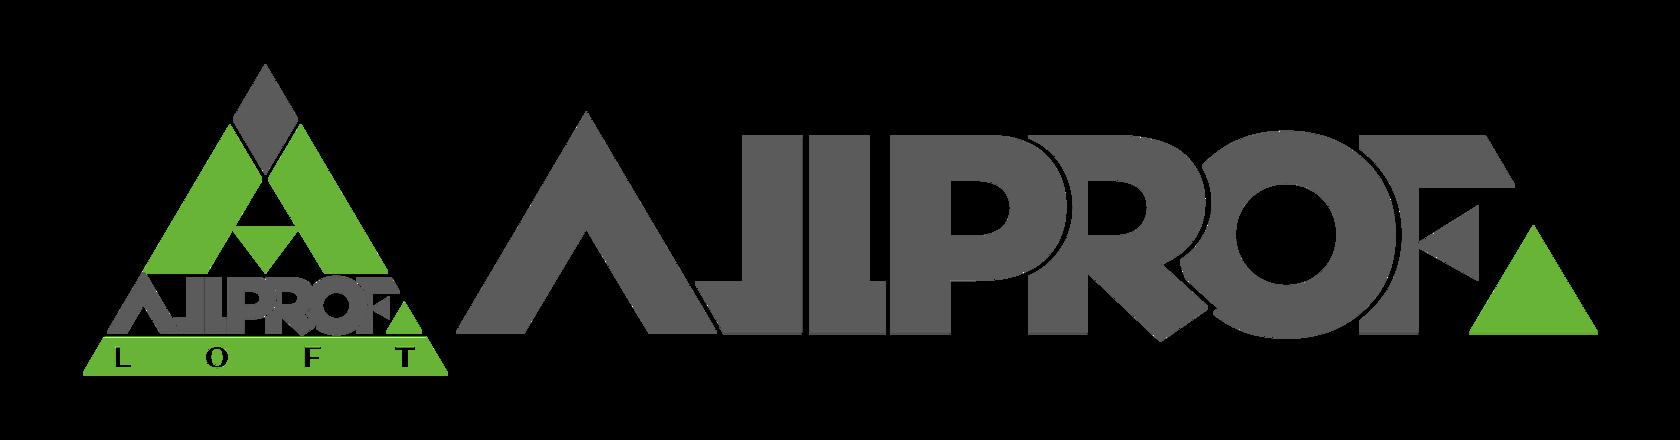 ALLPROF